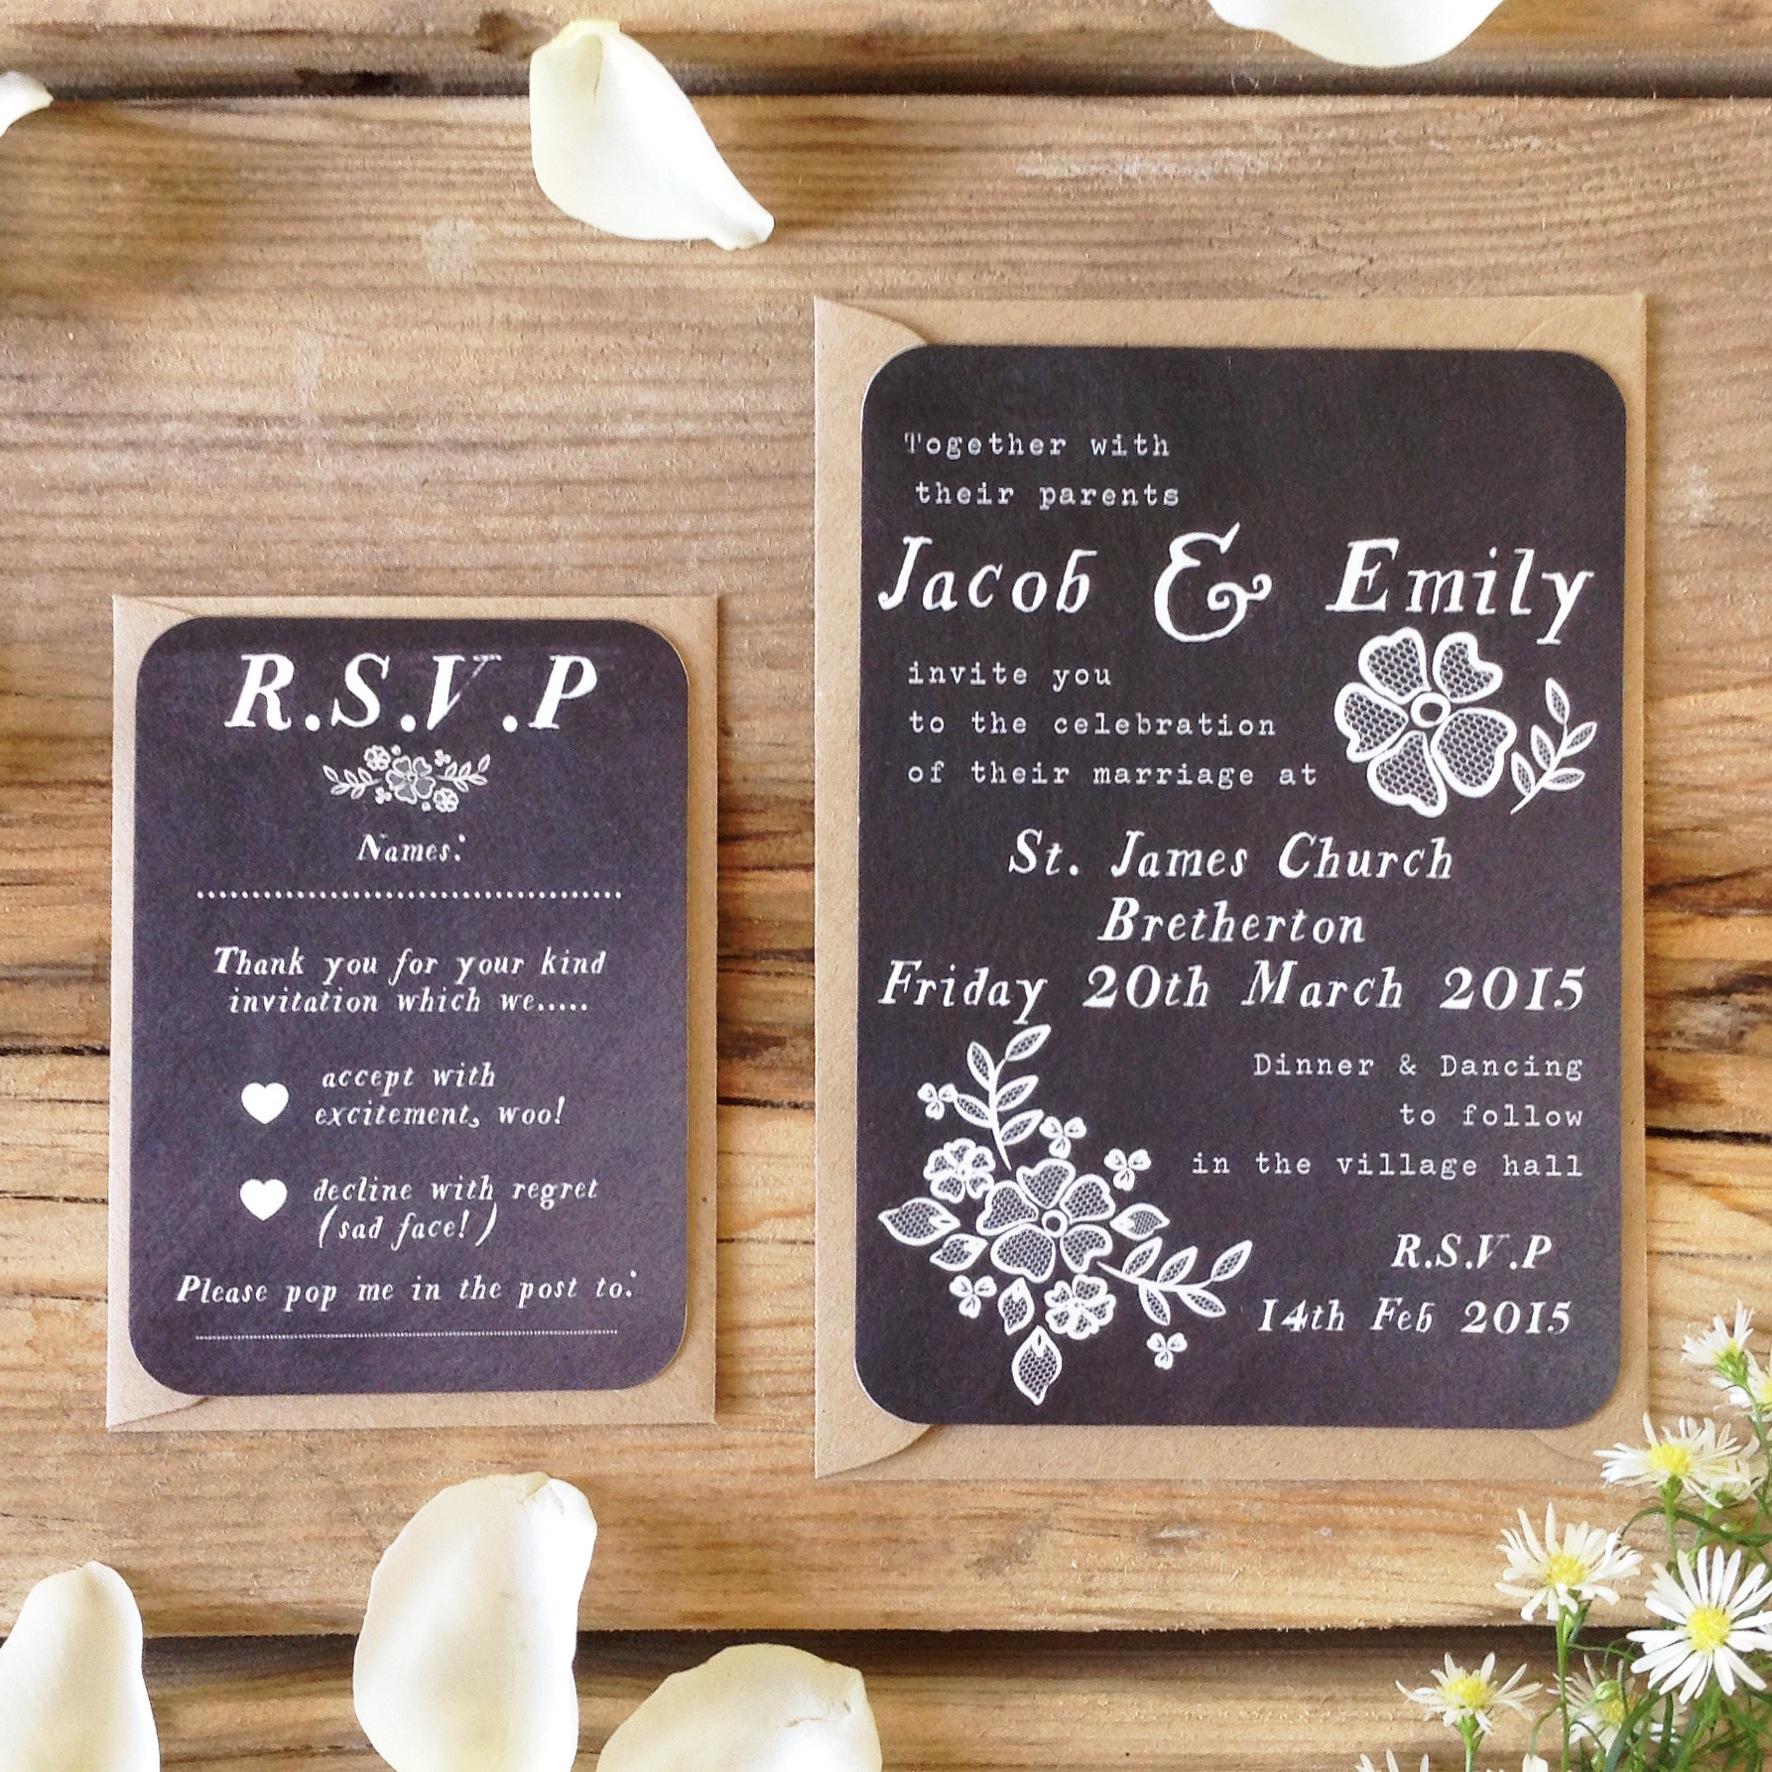 5 Of The Best Chalkboard Wedding Invites Paper Bride Blog